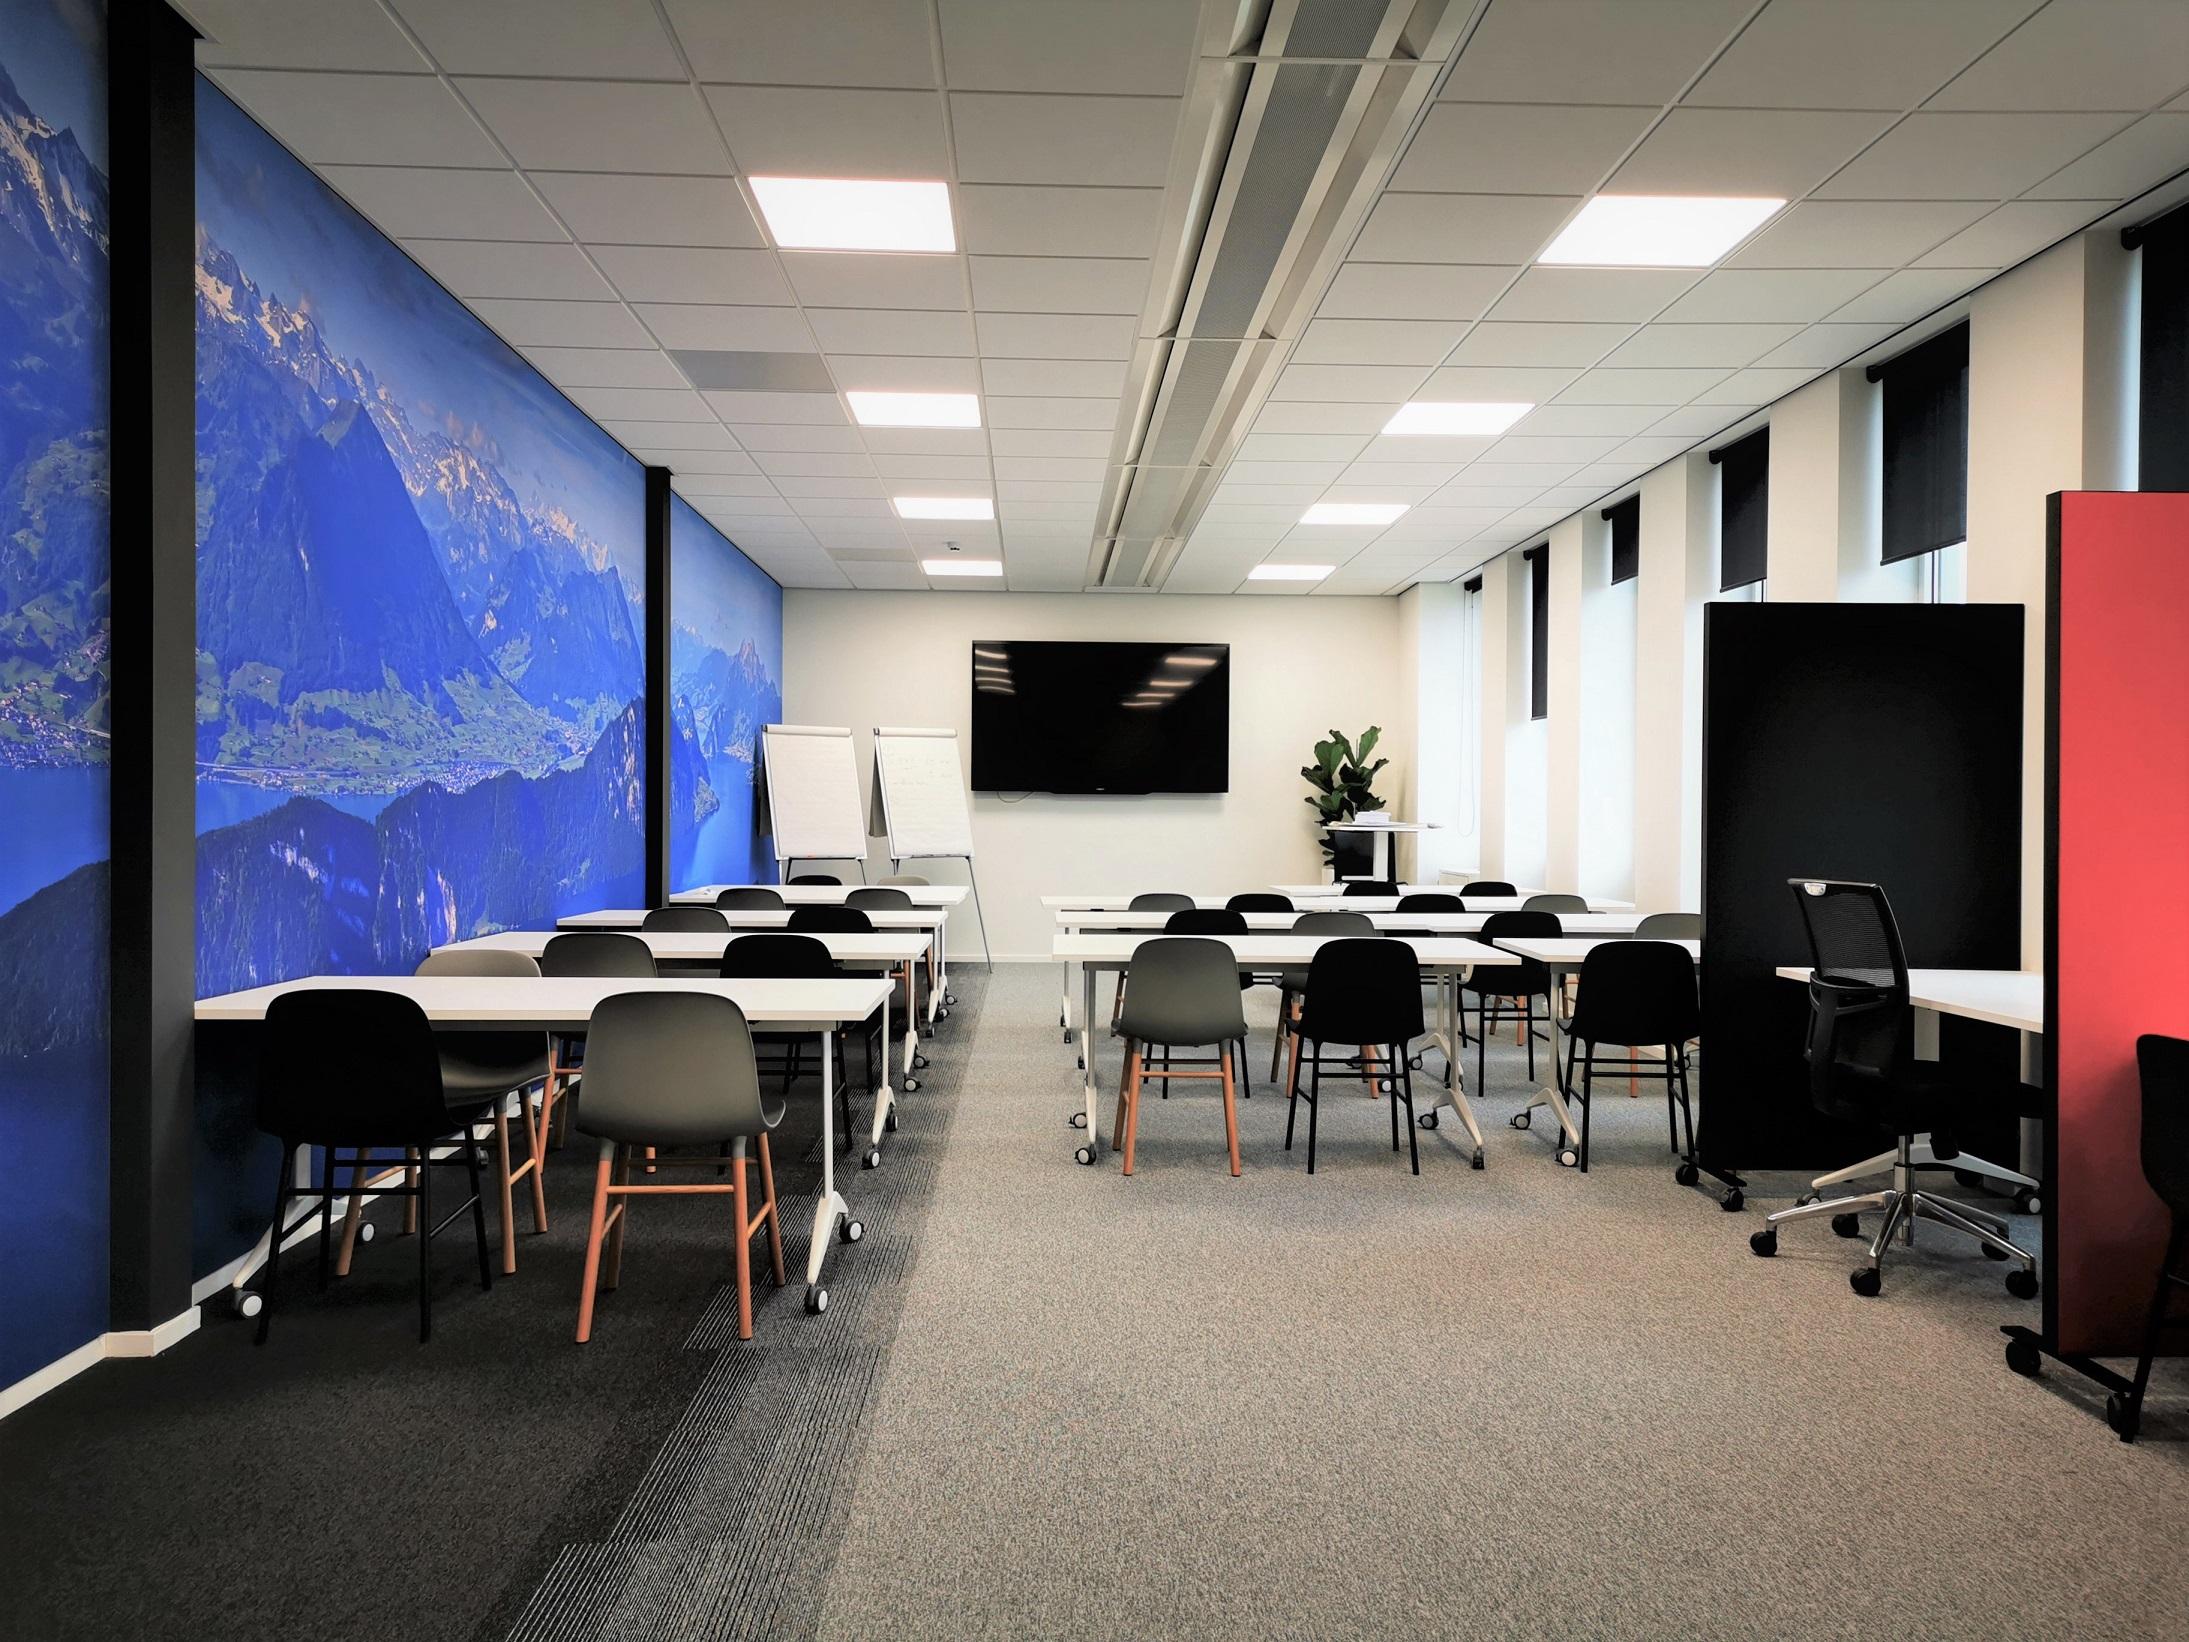 trainingsruimte kantoor design zwitserland